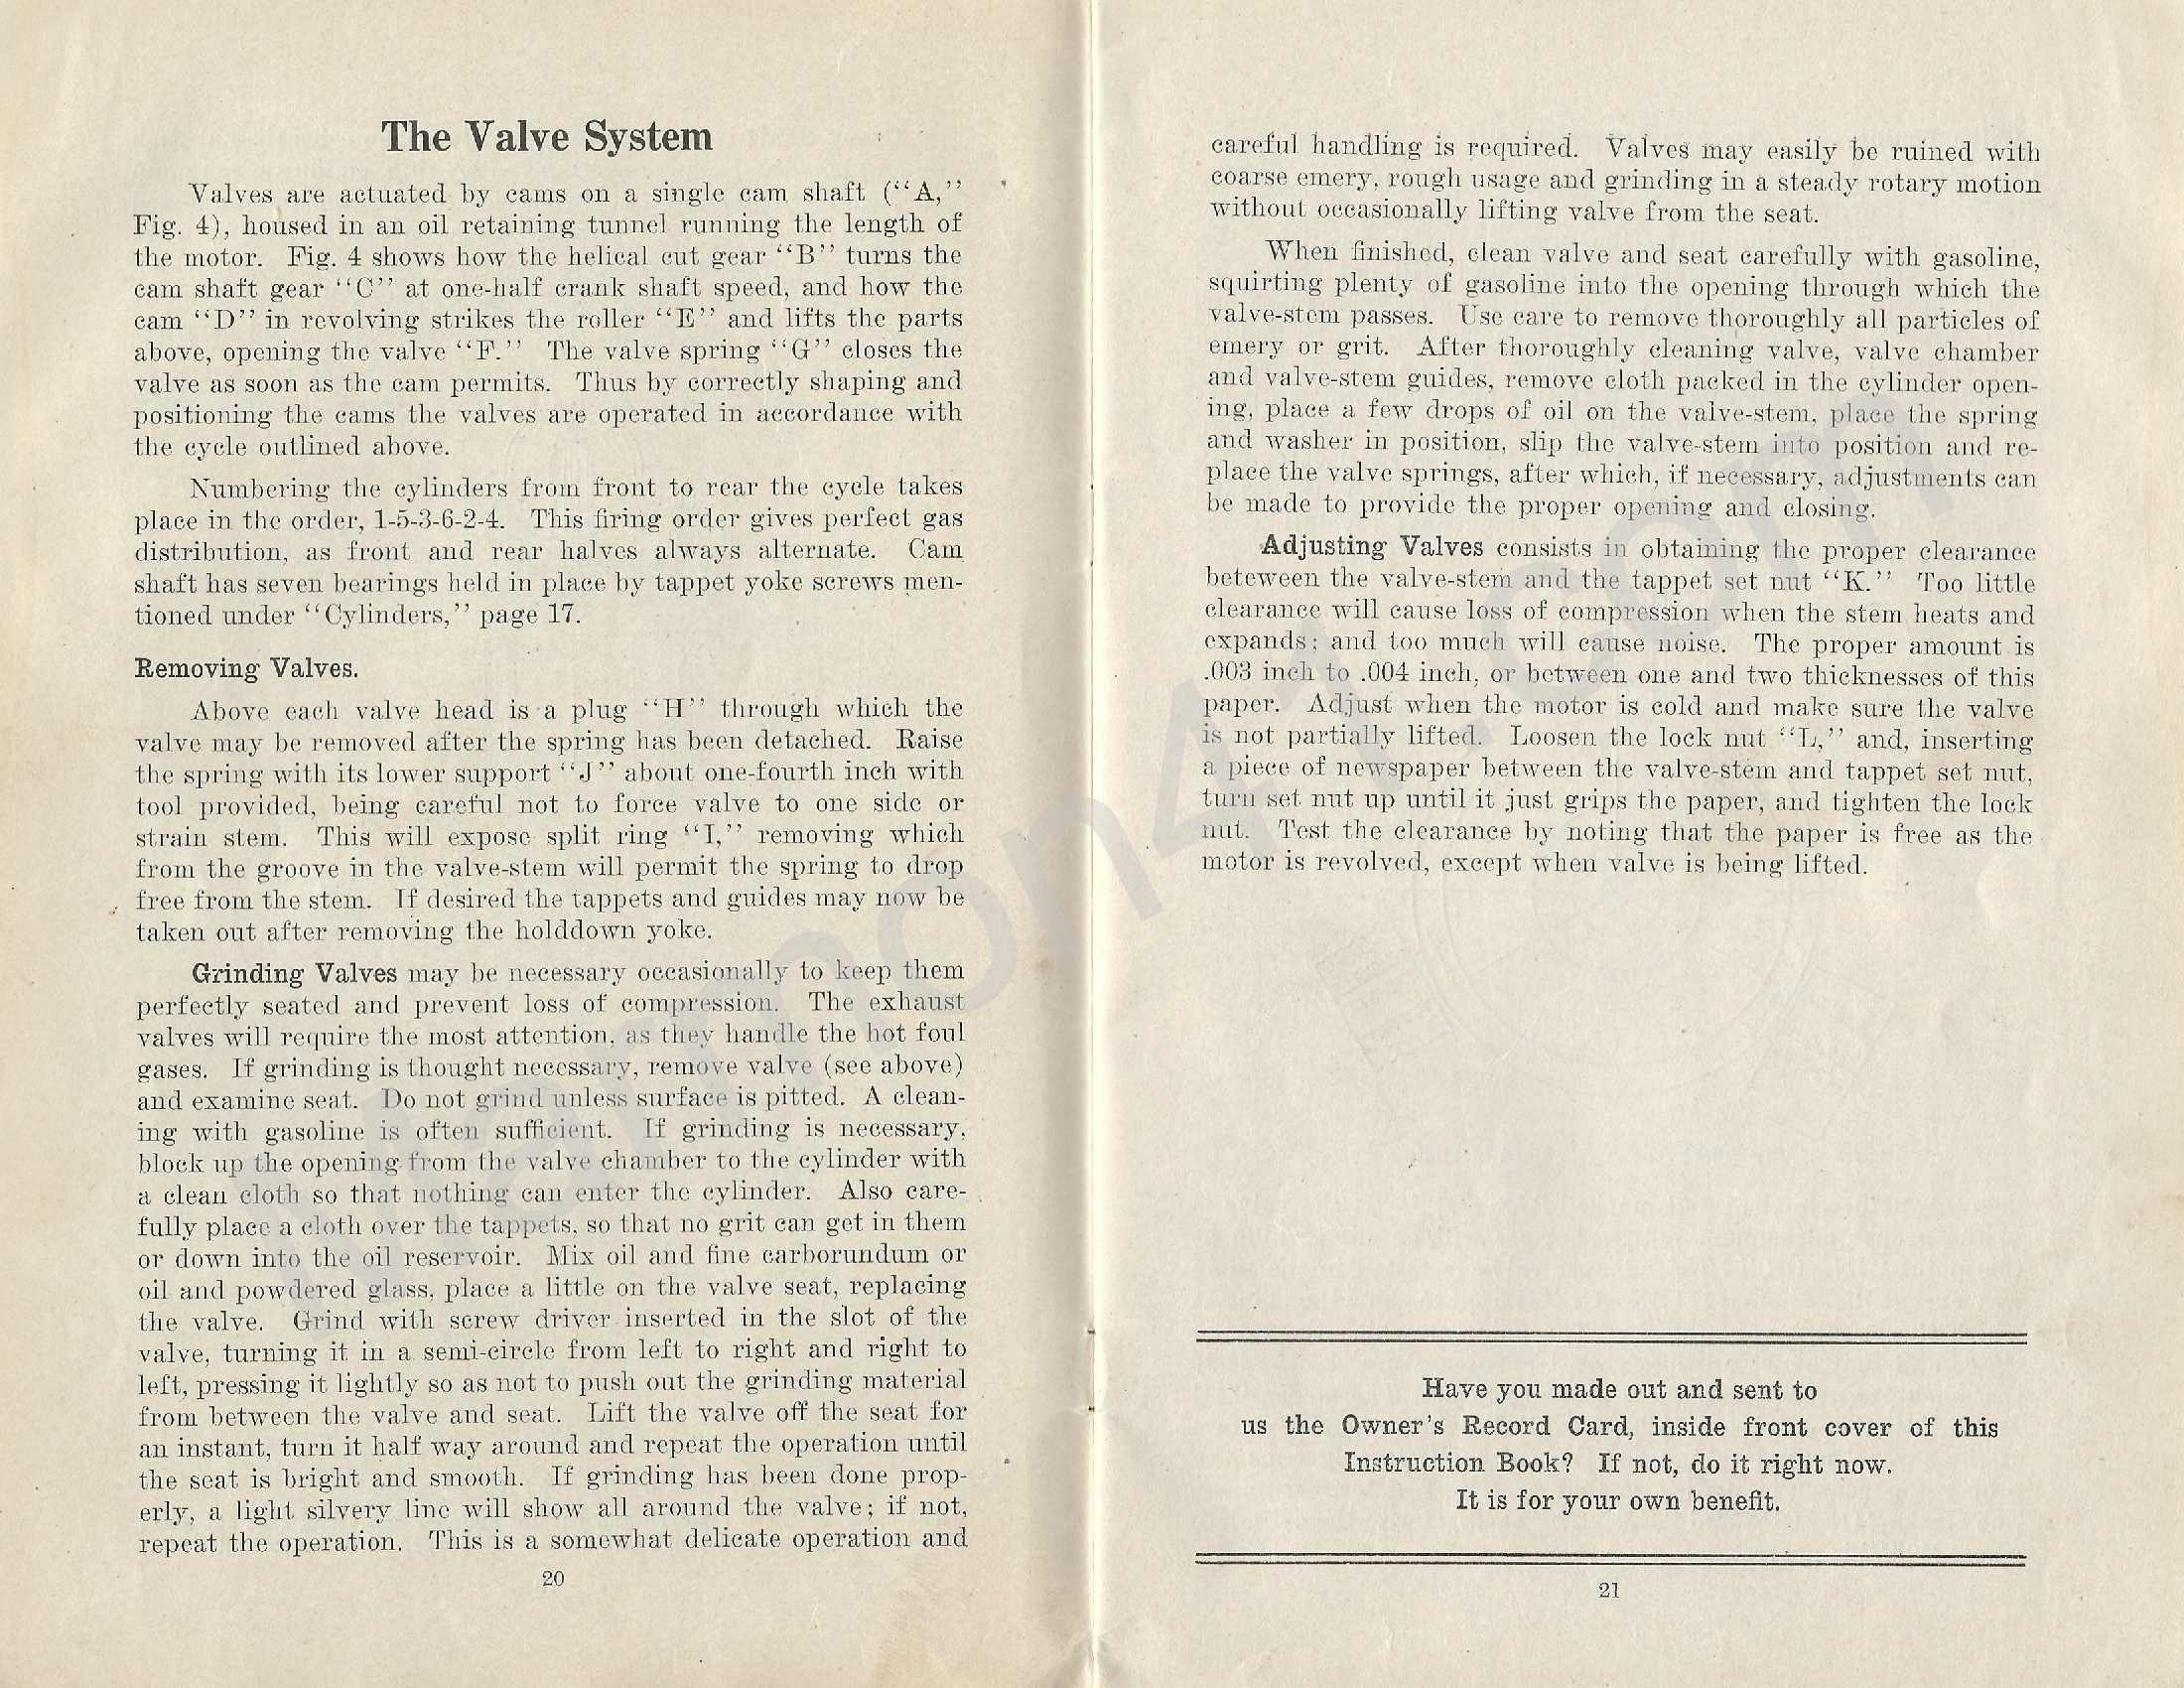 1915-07-01_Marmon41_Info_Book_1534-B_12